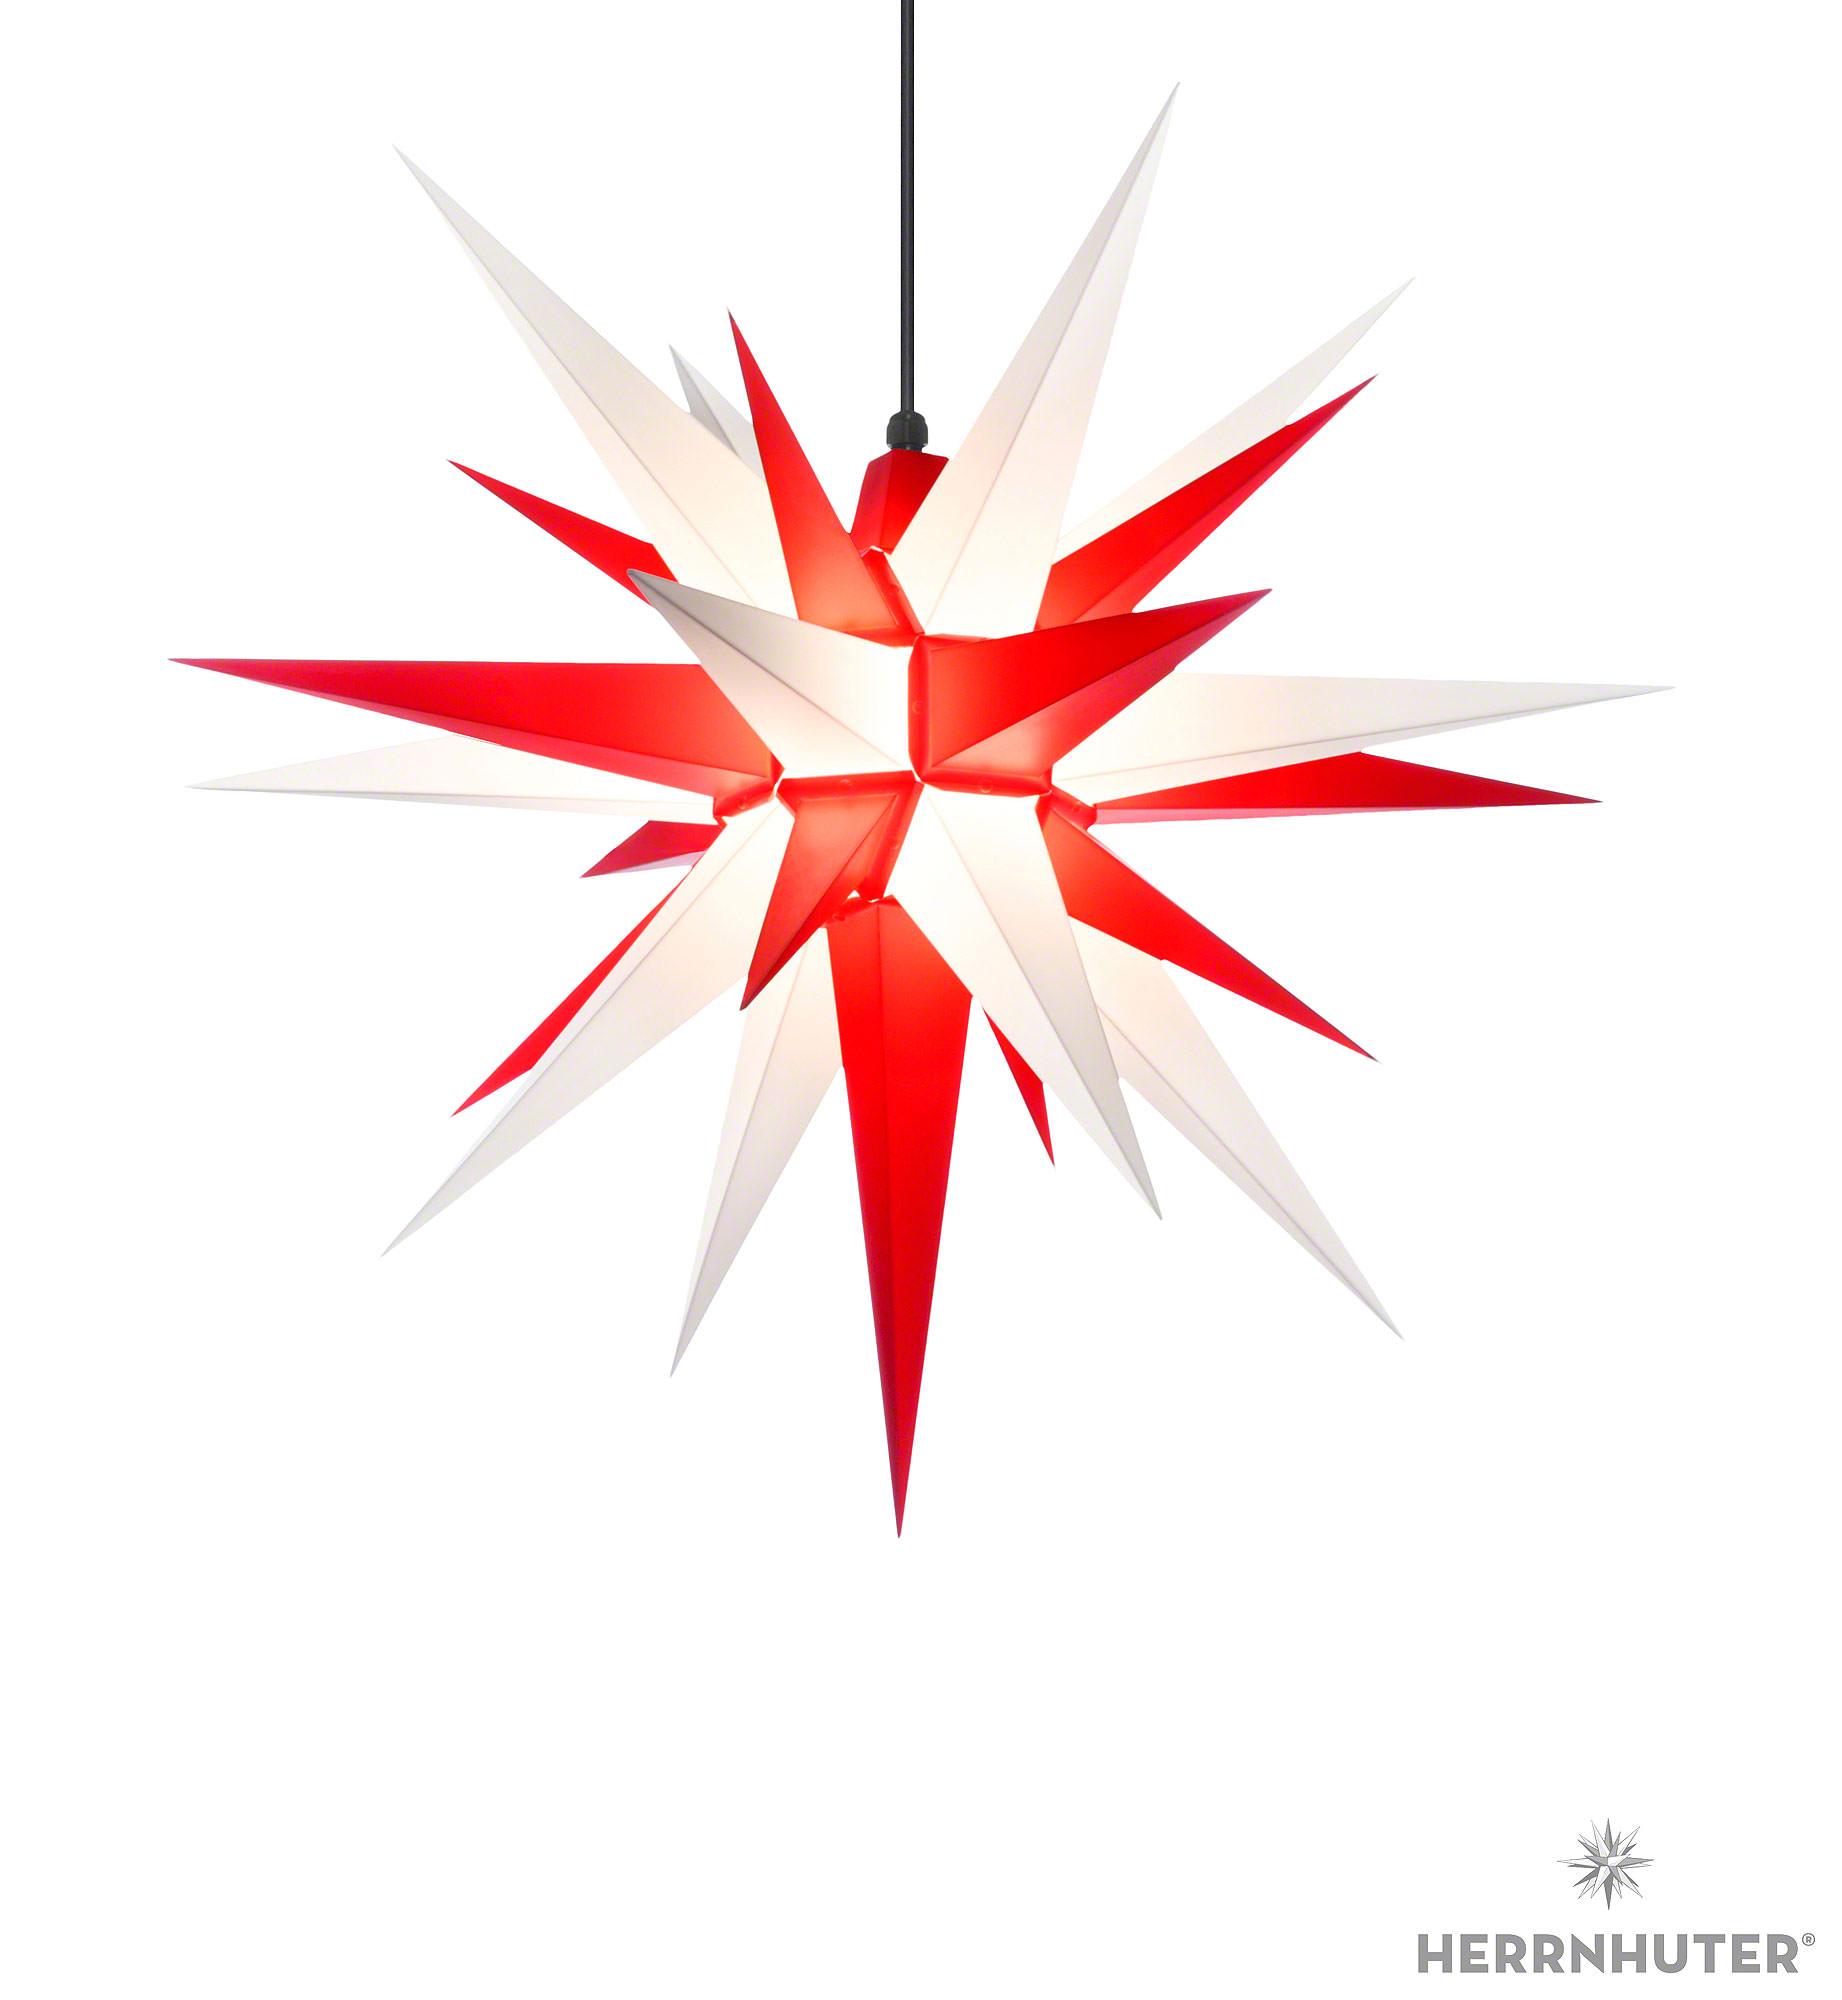 herrnhuter stern a7 weiss rot kunststoff 68 cm von herrnhuter sterne. Black Bedroom Furniture Sets. Home Design Ideas